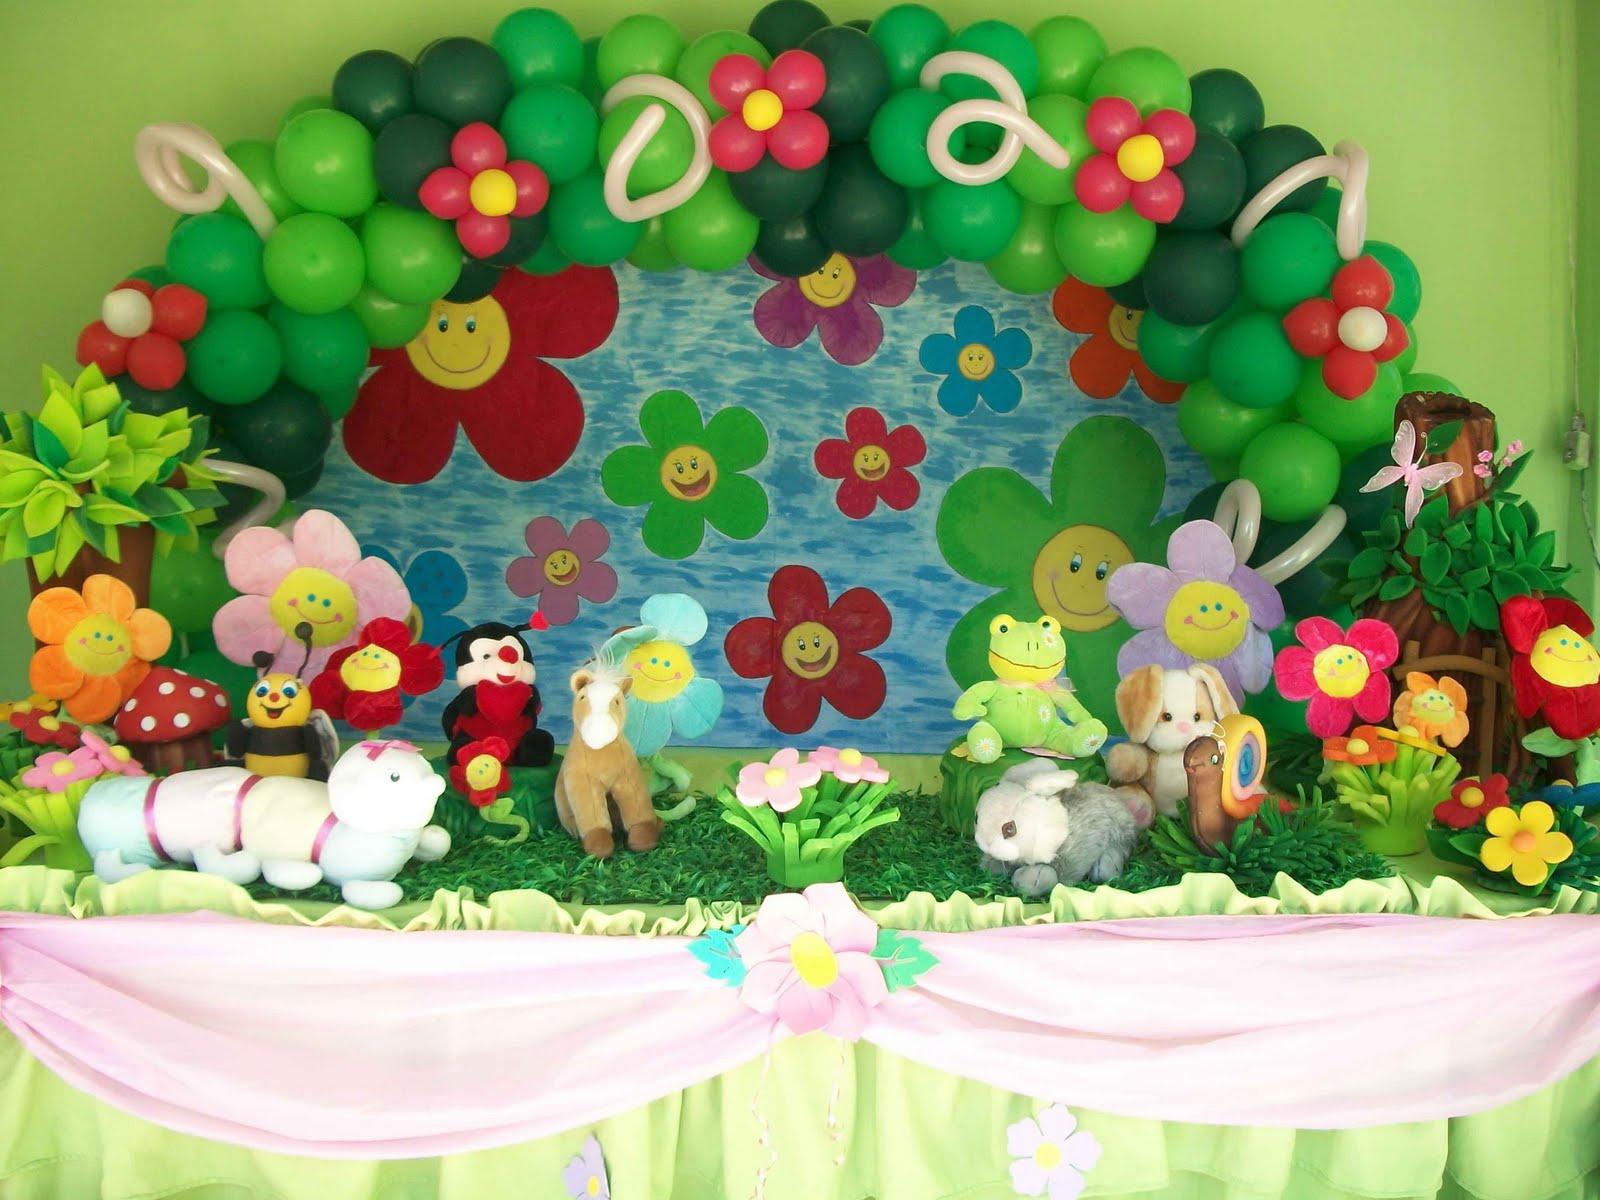 festa jardim dos ursos:Alice Festa Infantil: Jardim dos Bichinho – Festa da Isabella – 16